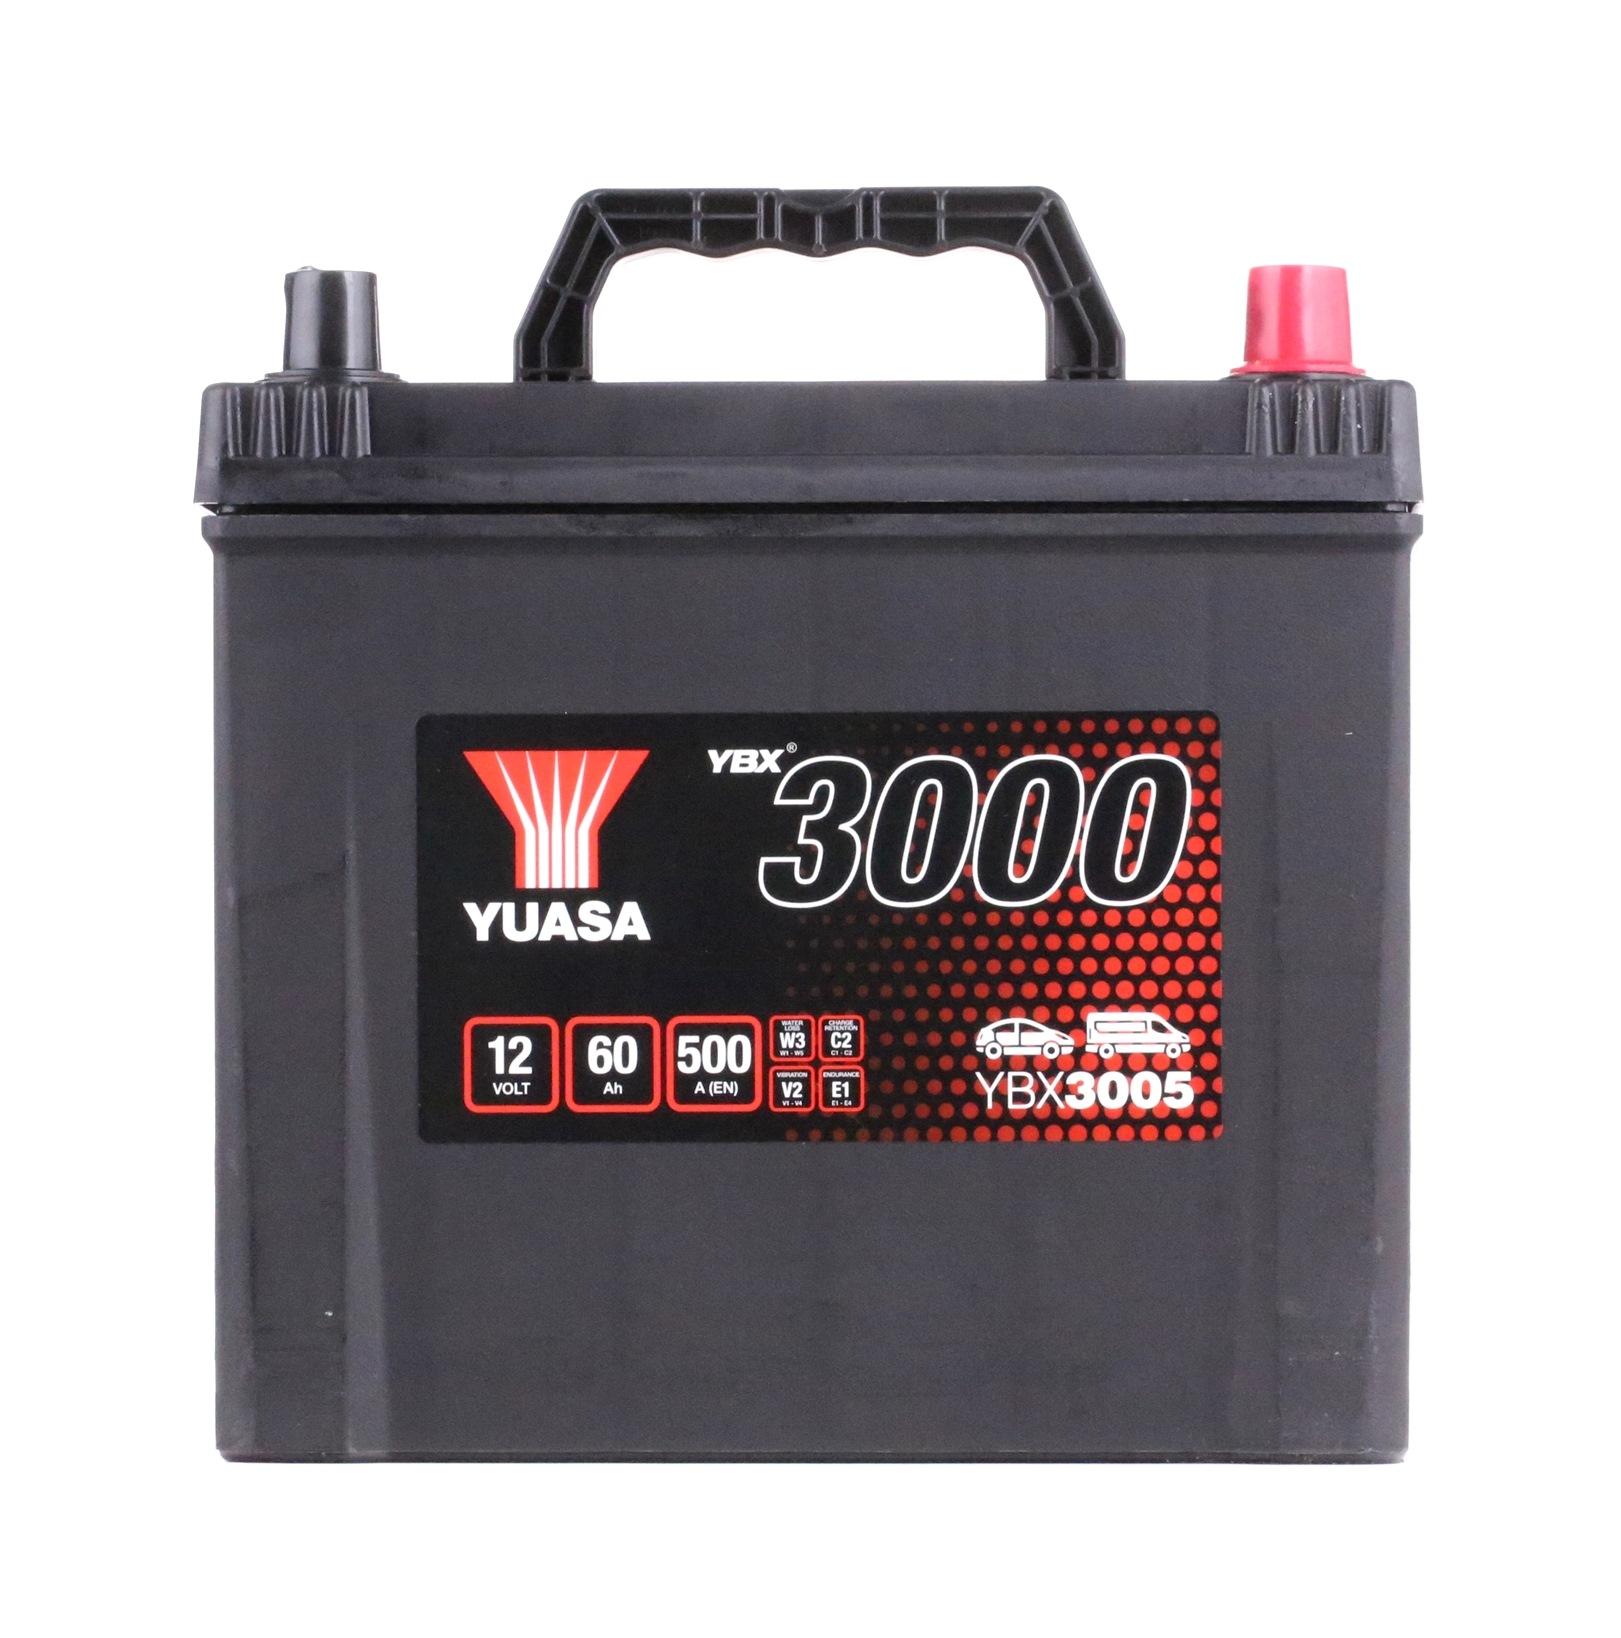 Batterie YUASA YBX3005 Bewertung